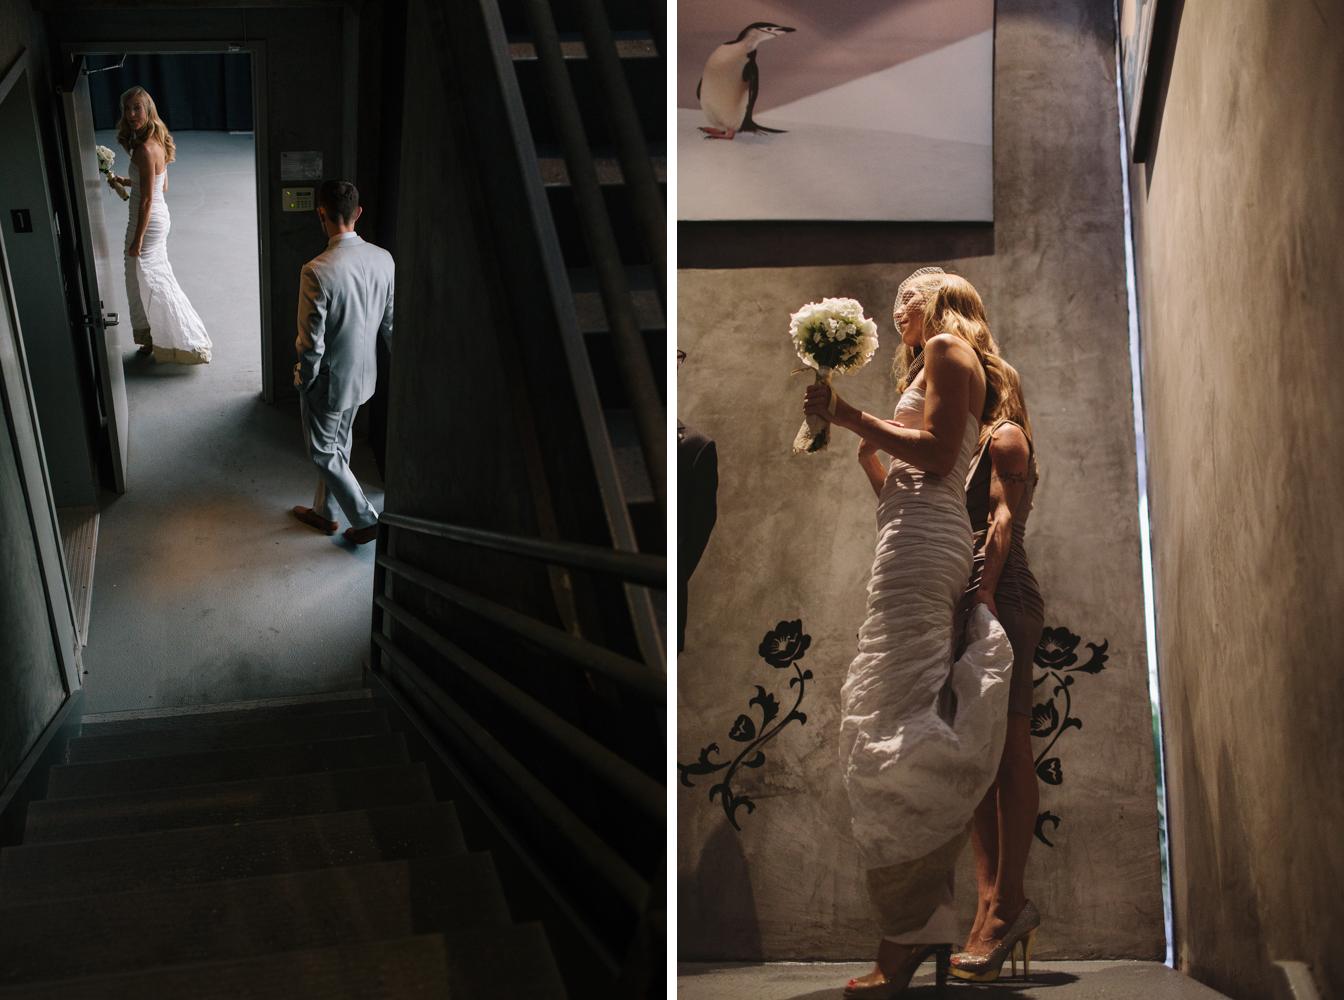 20121006_mcintosh-wed_5diiB_2461-2.jpg